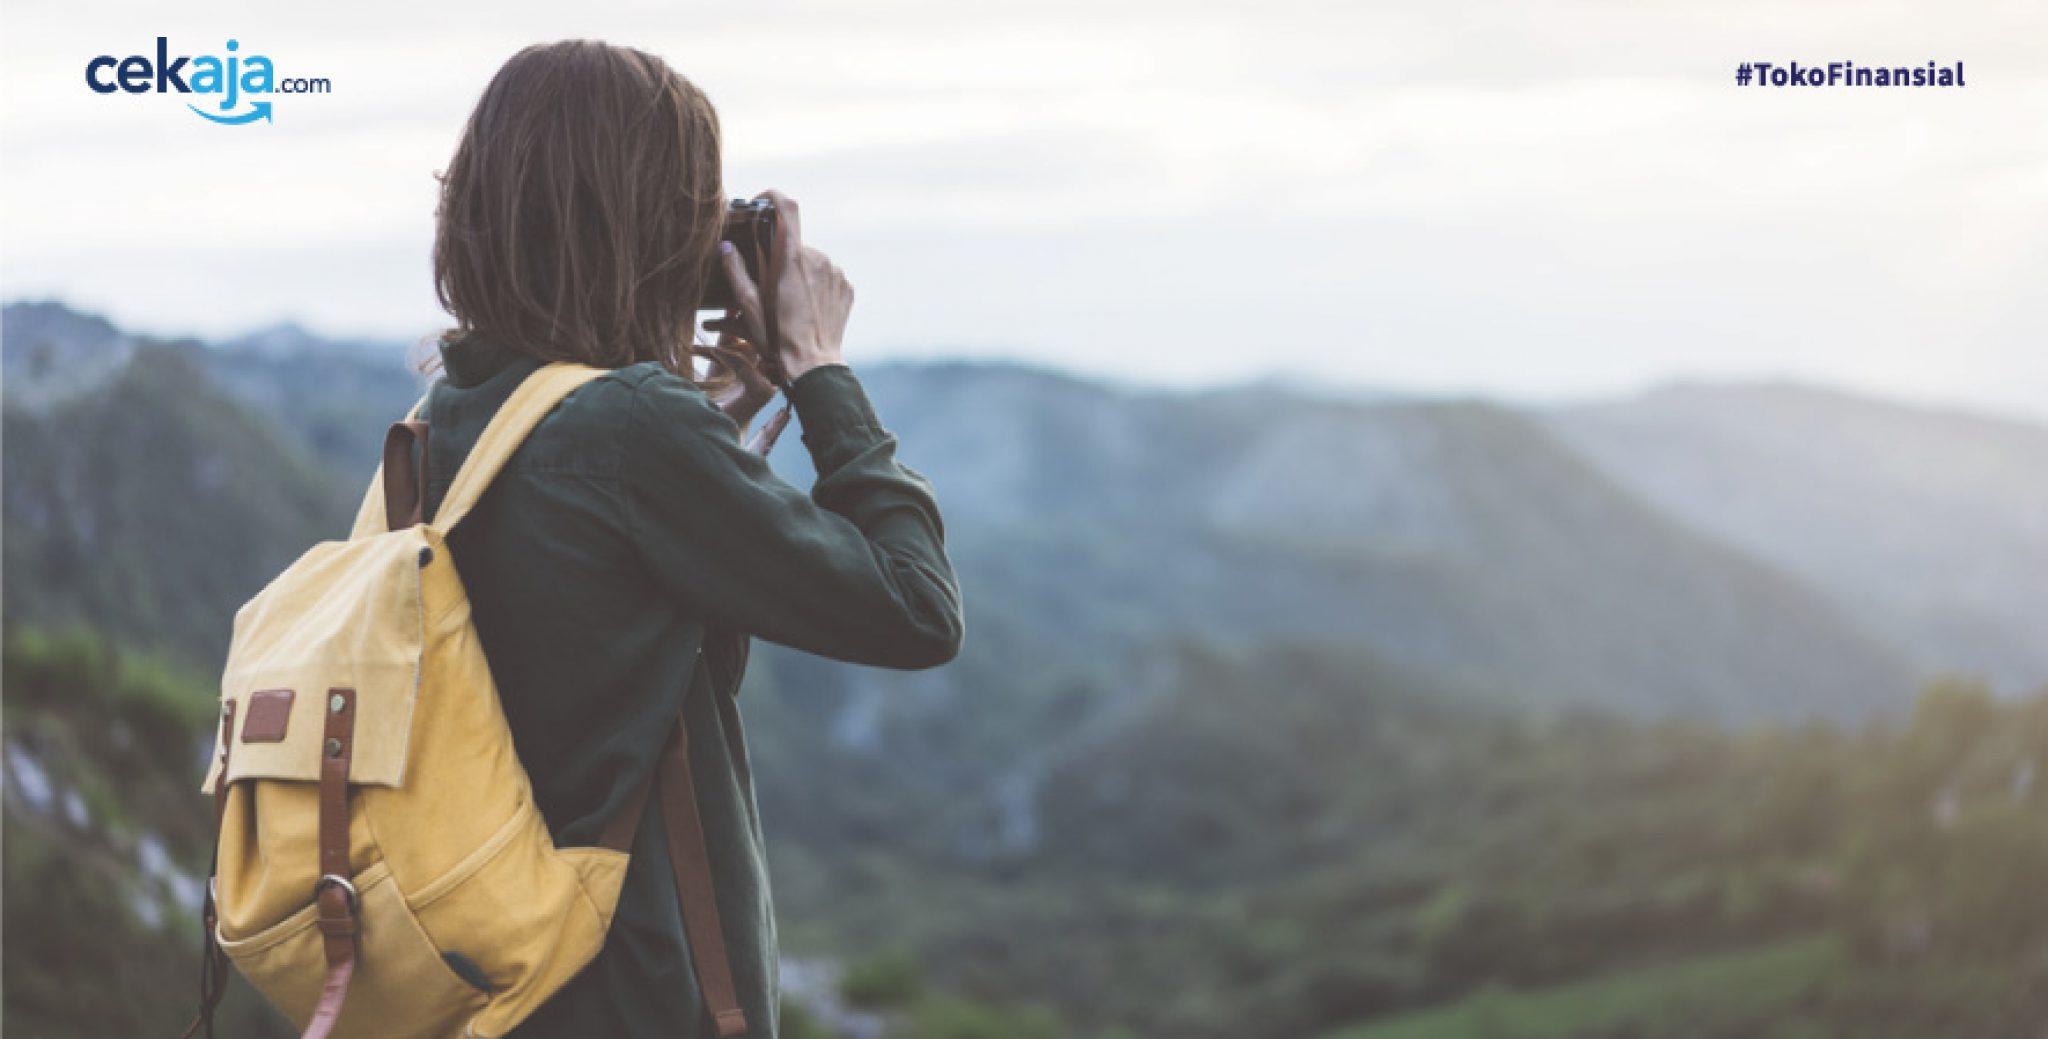 tips traveling _ asuransi perjalanan - CekAja.com